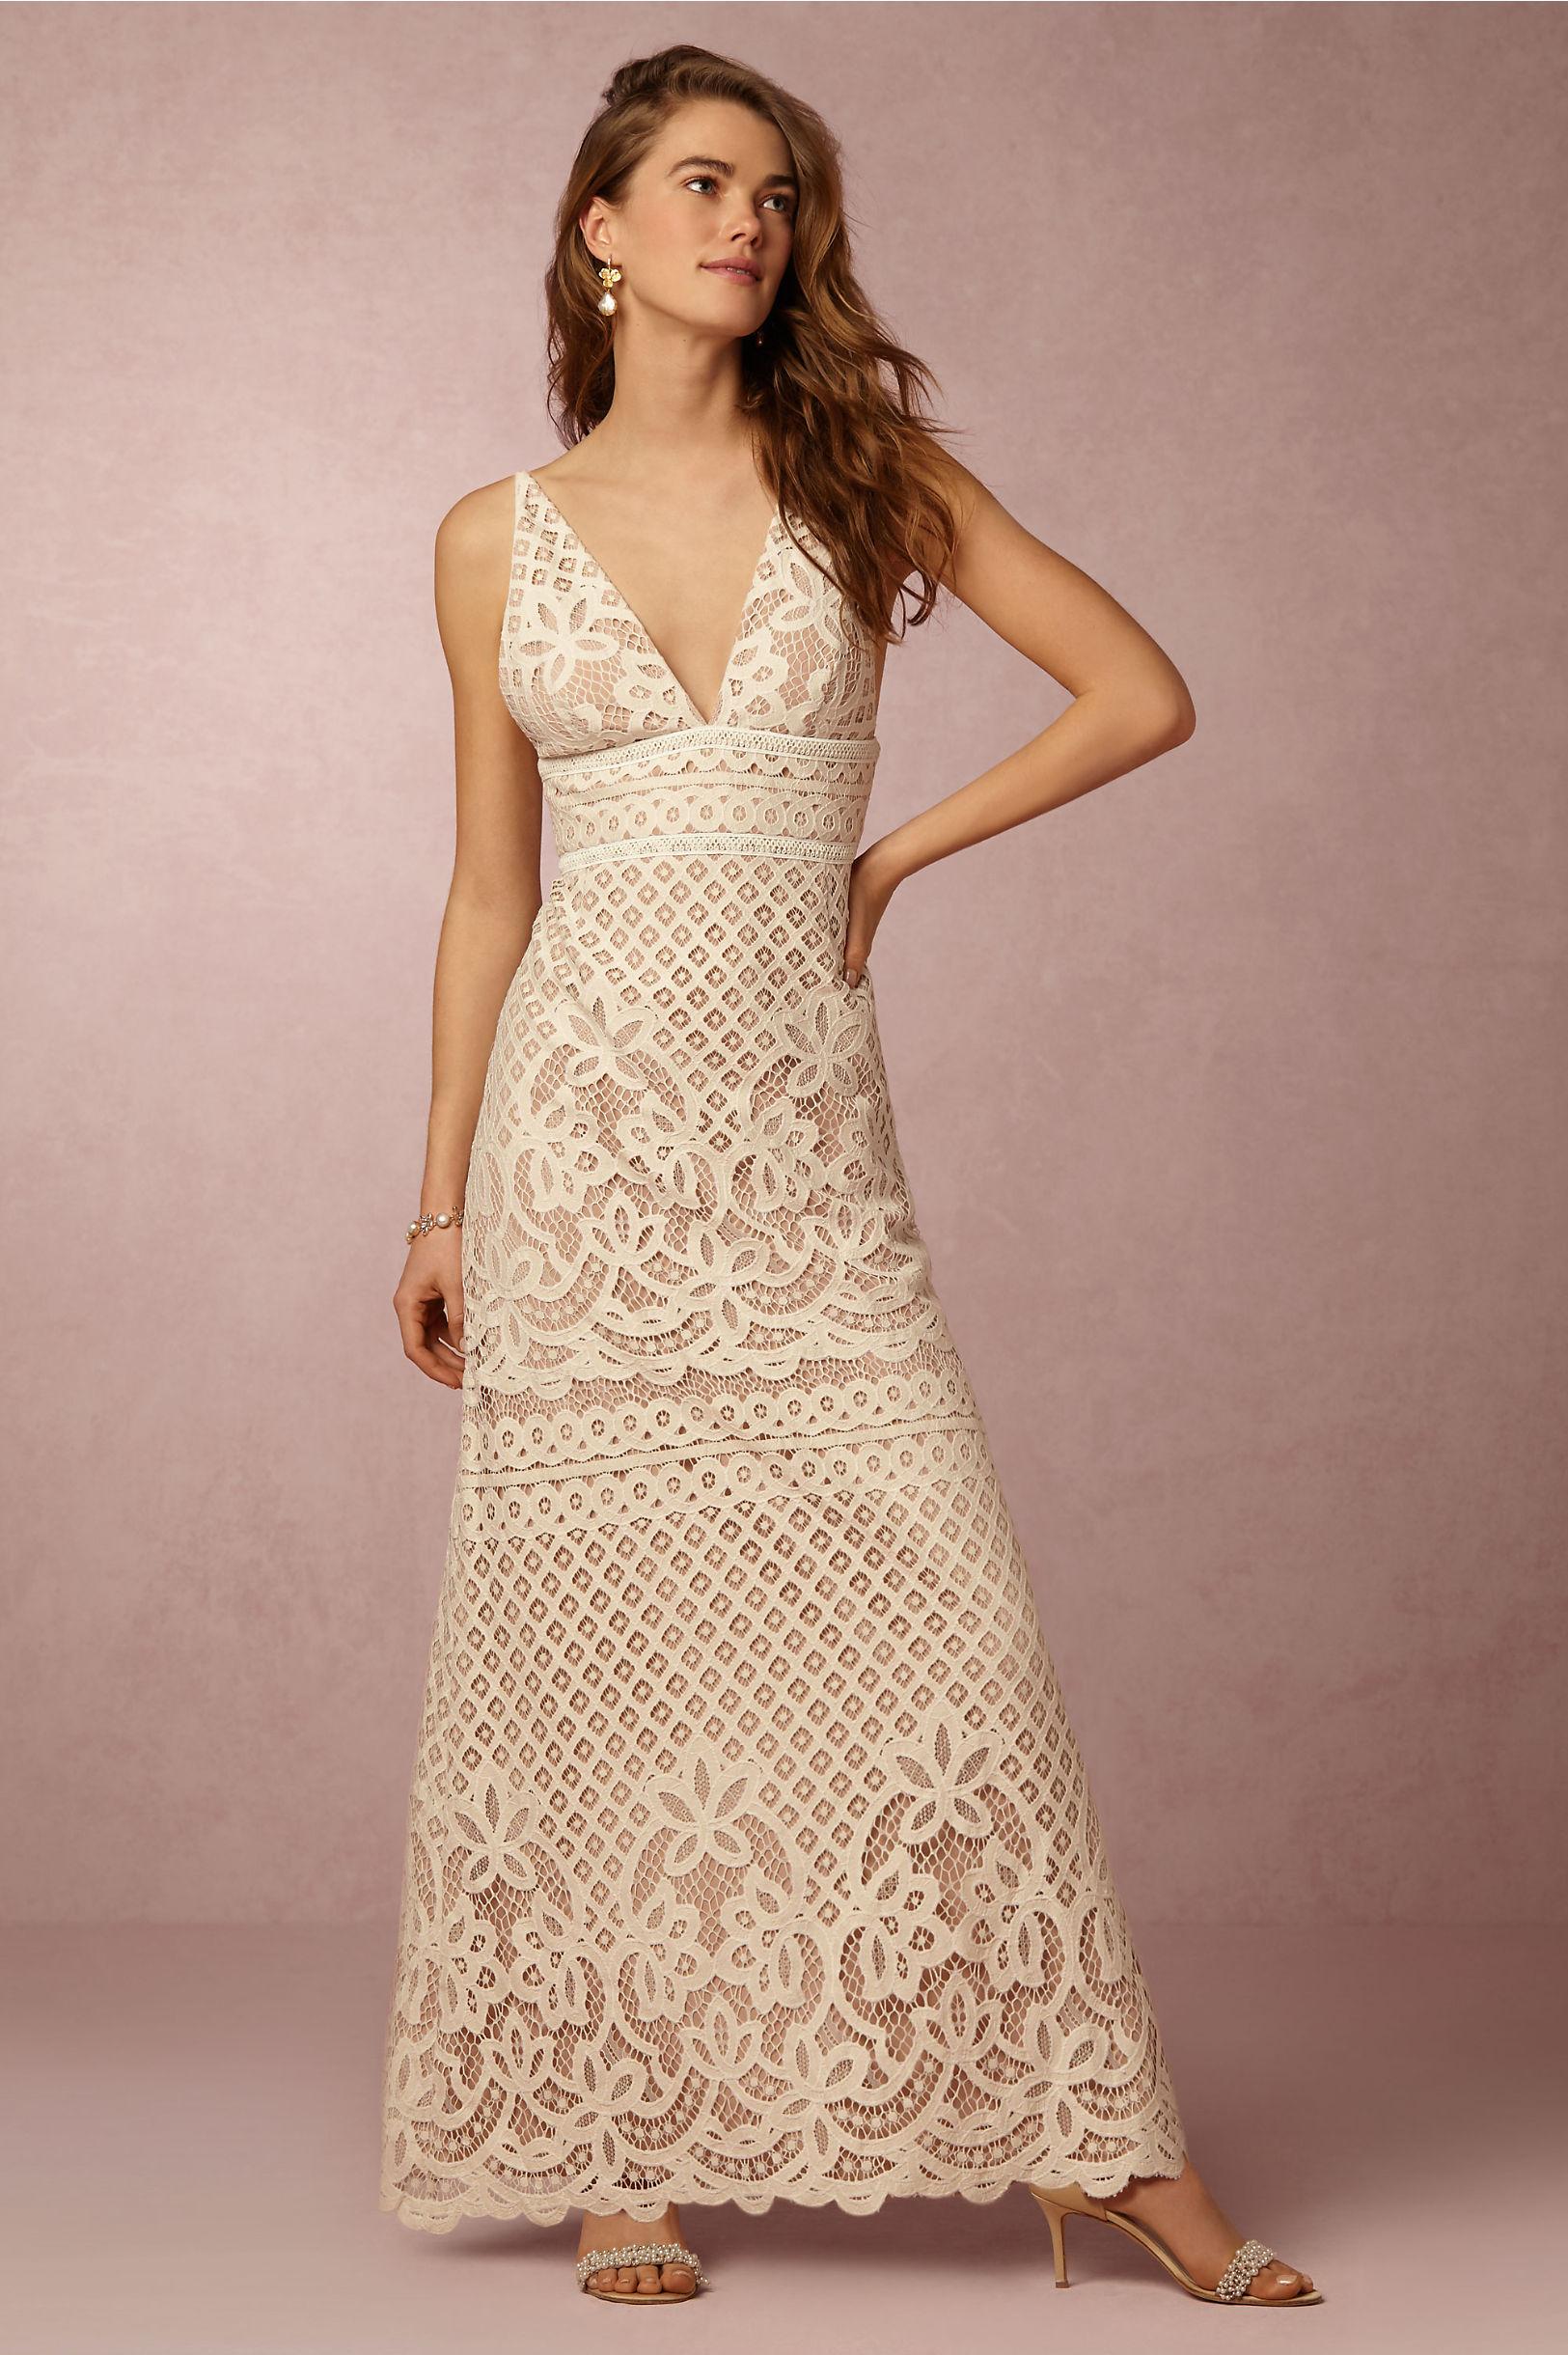 Sale of maxi dresses